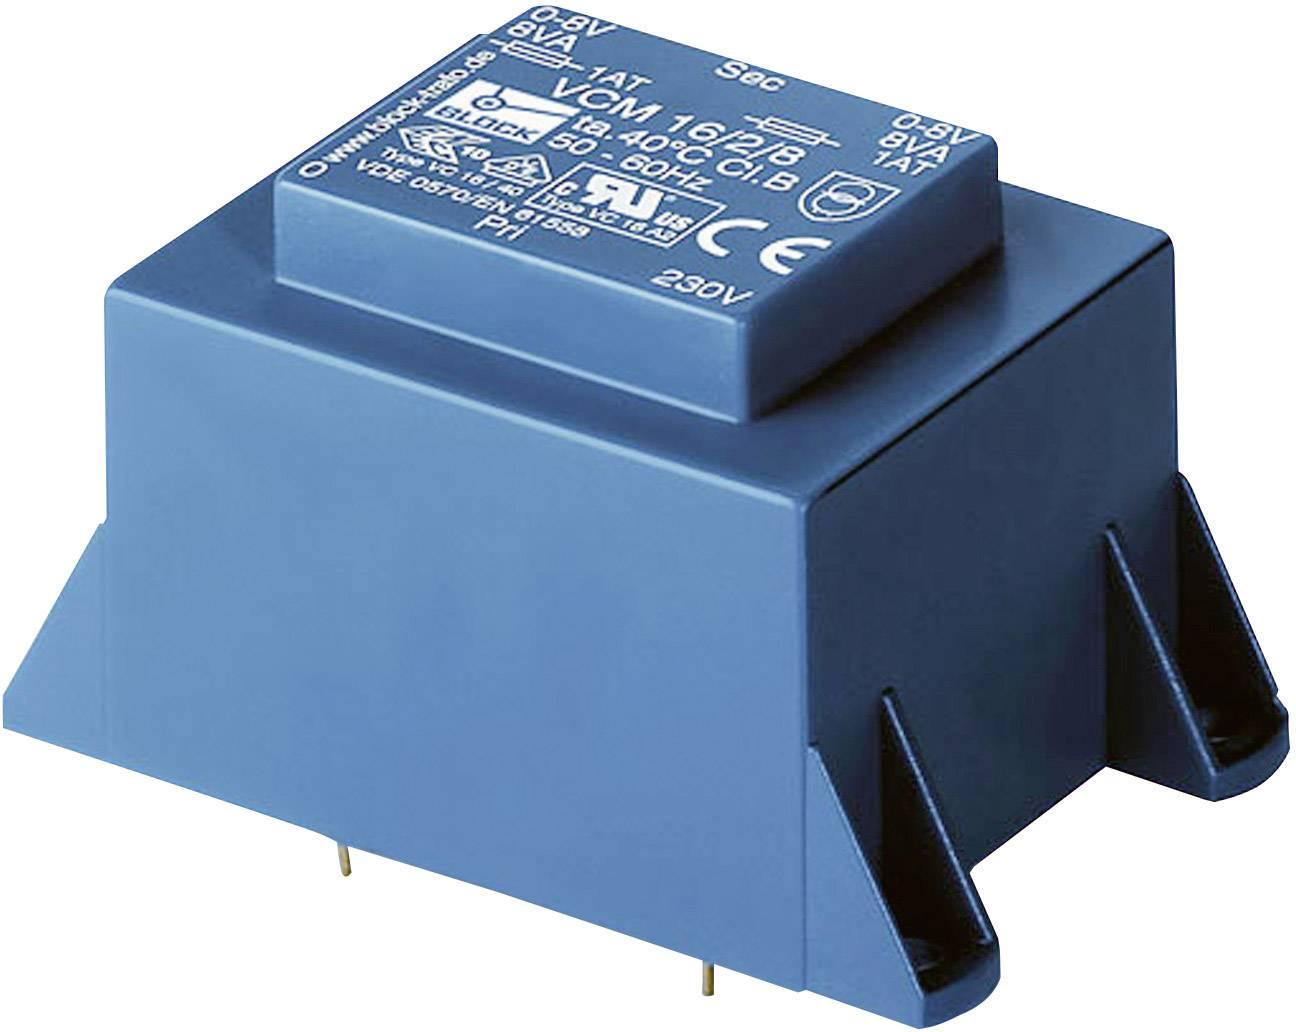 EI 66/34,7 Trasformatore per circuiti stampati VCM 50 VA 230 V 18 V 2.77 A 50 VA Block